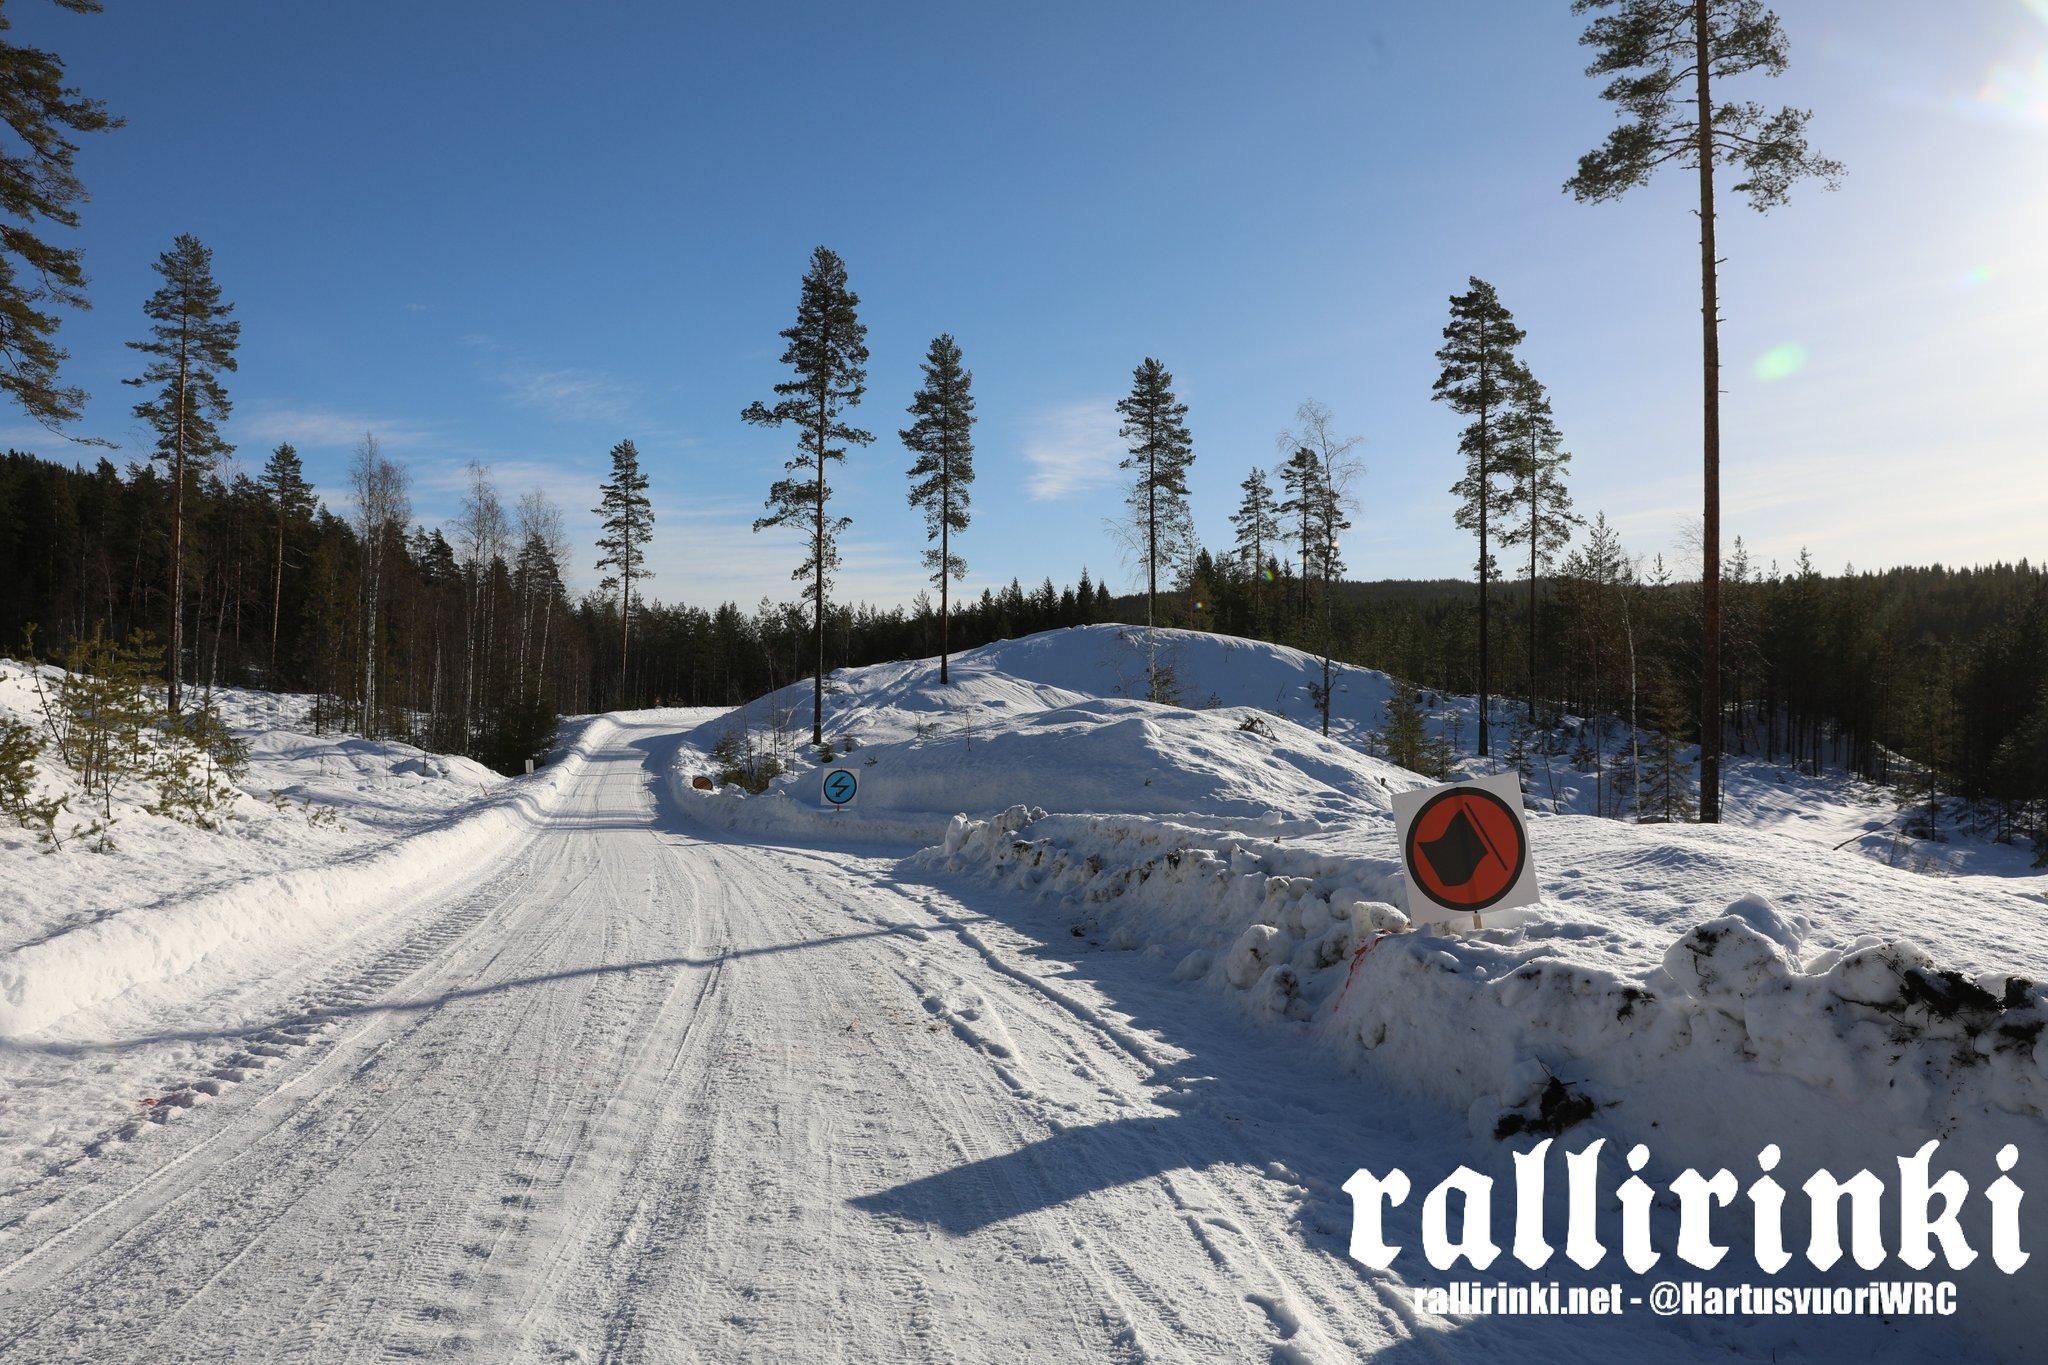 WRC: 67º Rallye Sweden [14-17 Febrero] - Página 2 DzST1cYWkAE9MA4